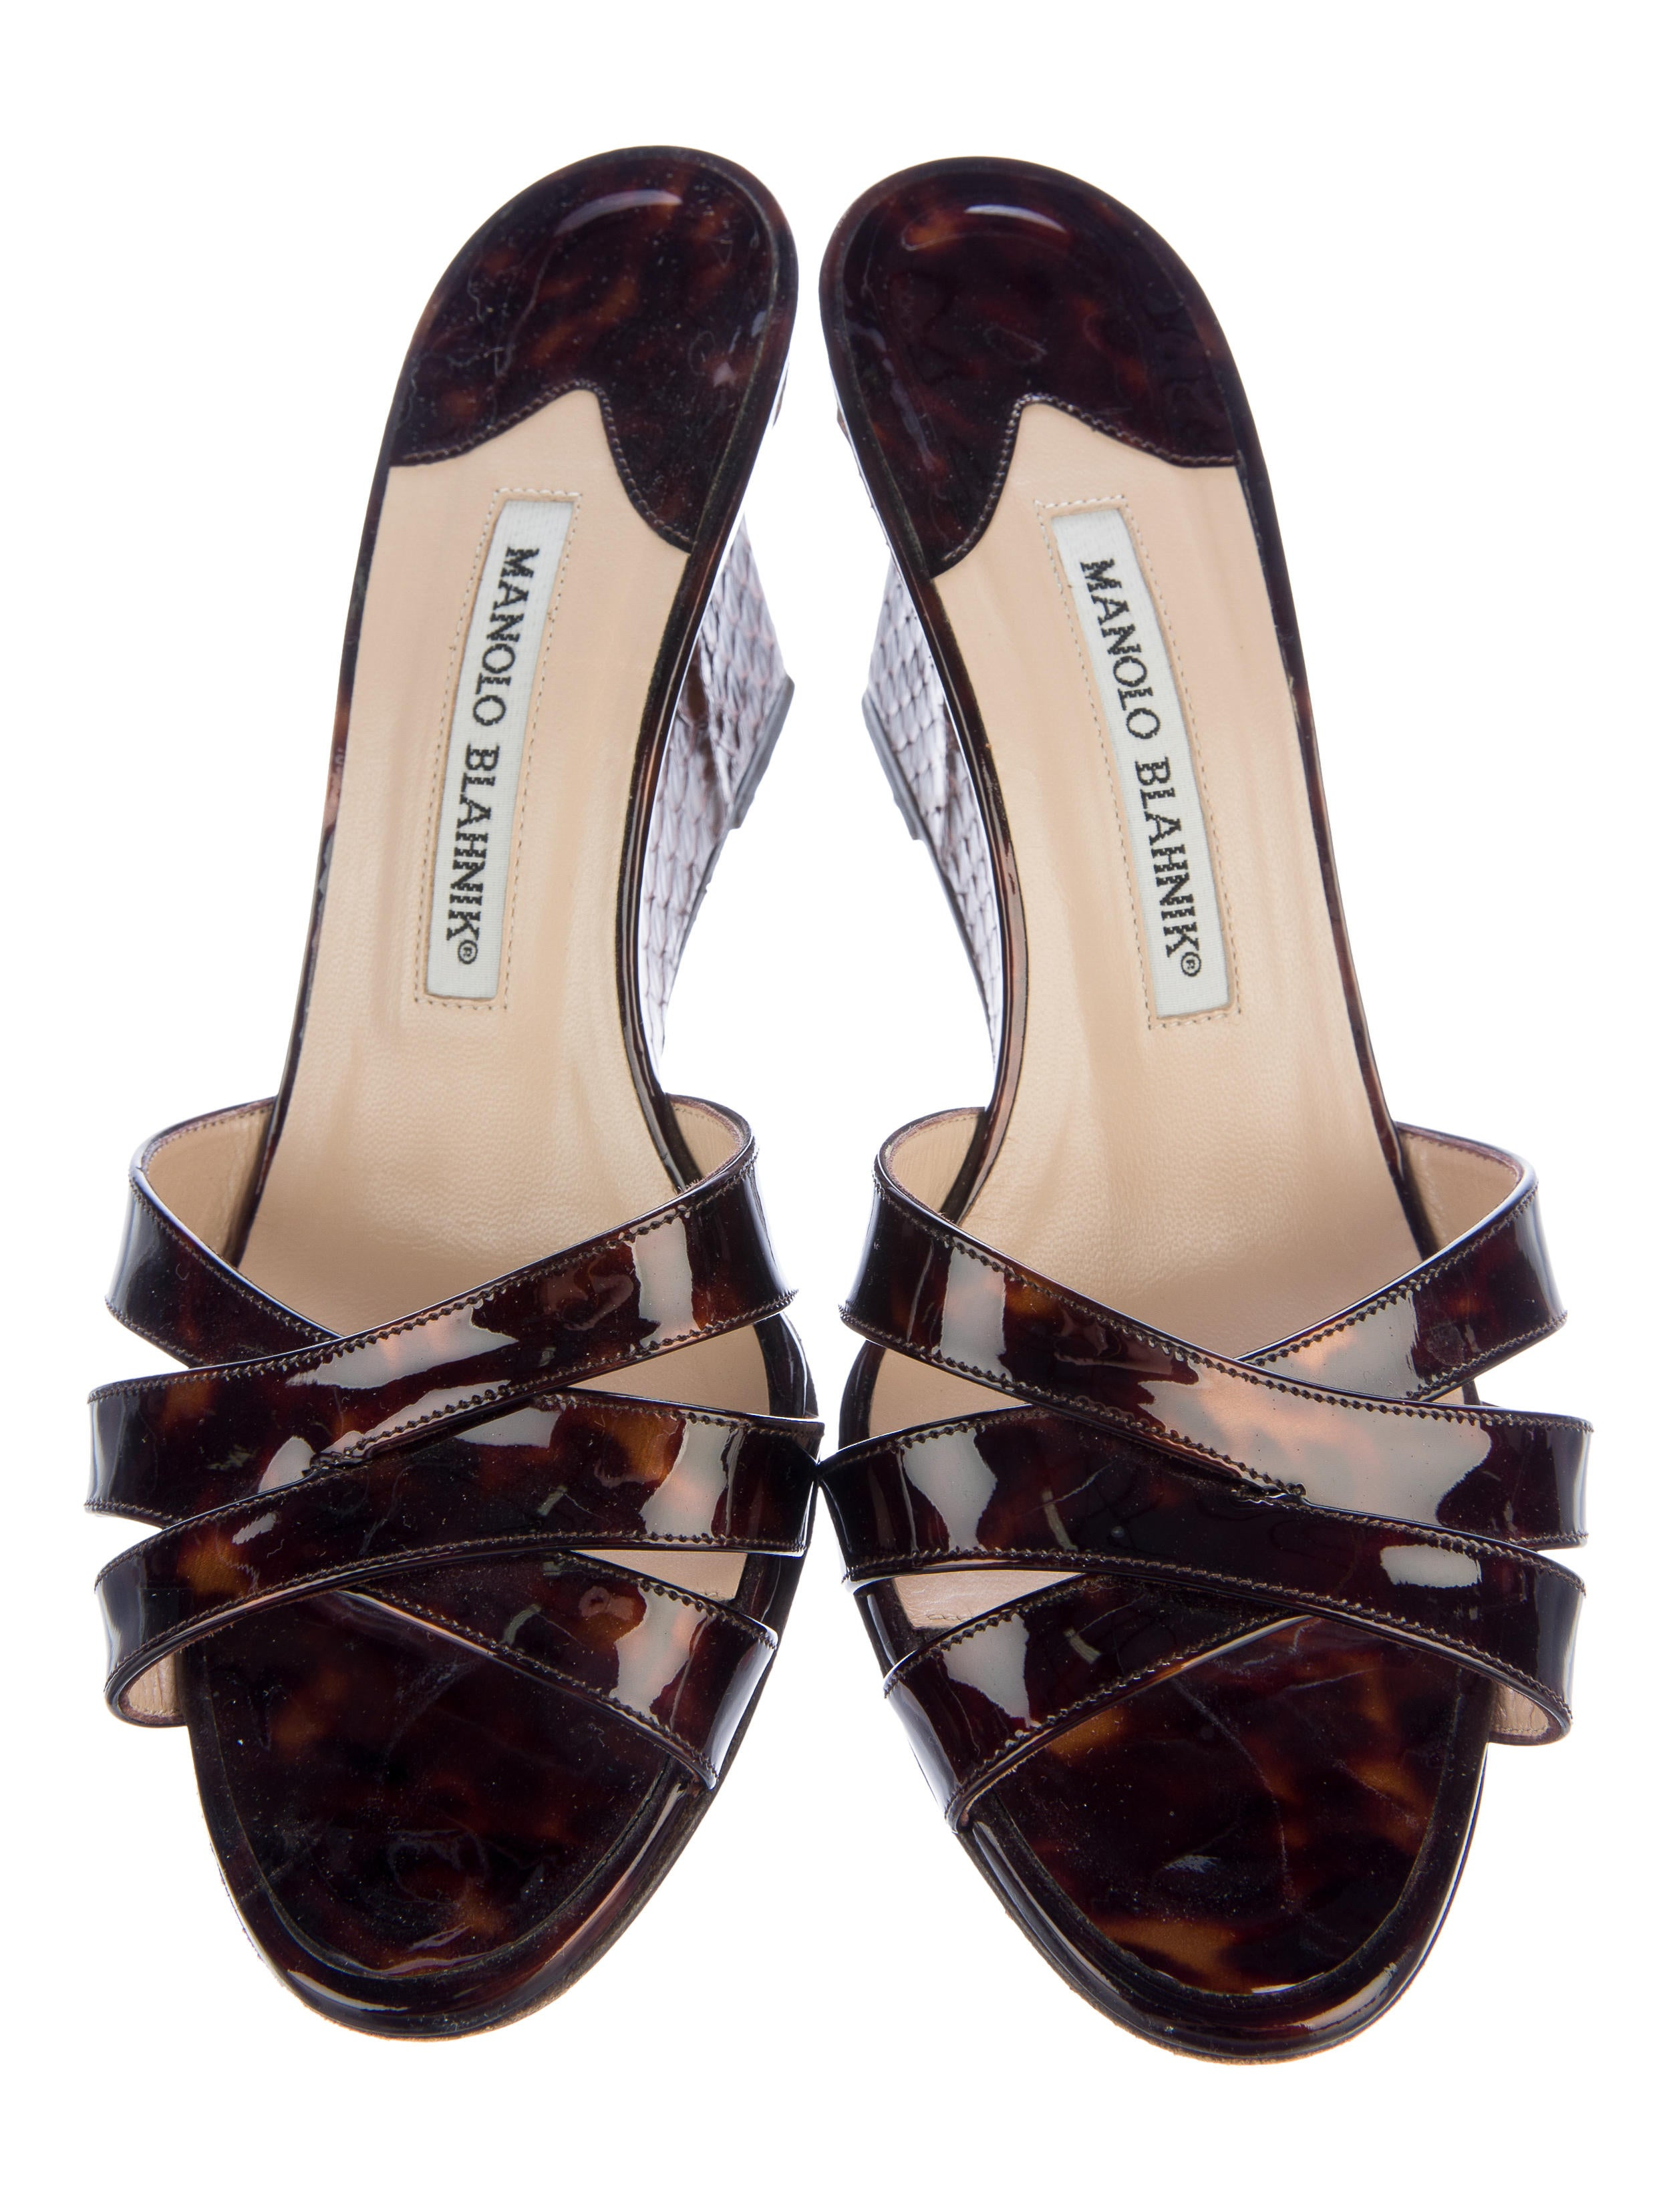 manolo blahnik snakeskin trimmed wedge sandals shoes